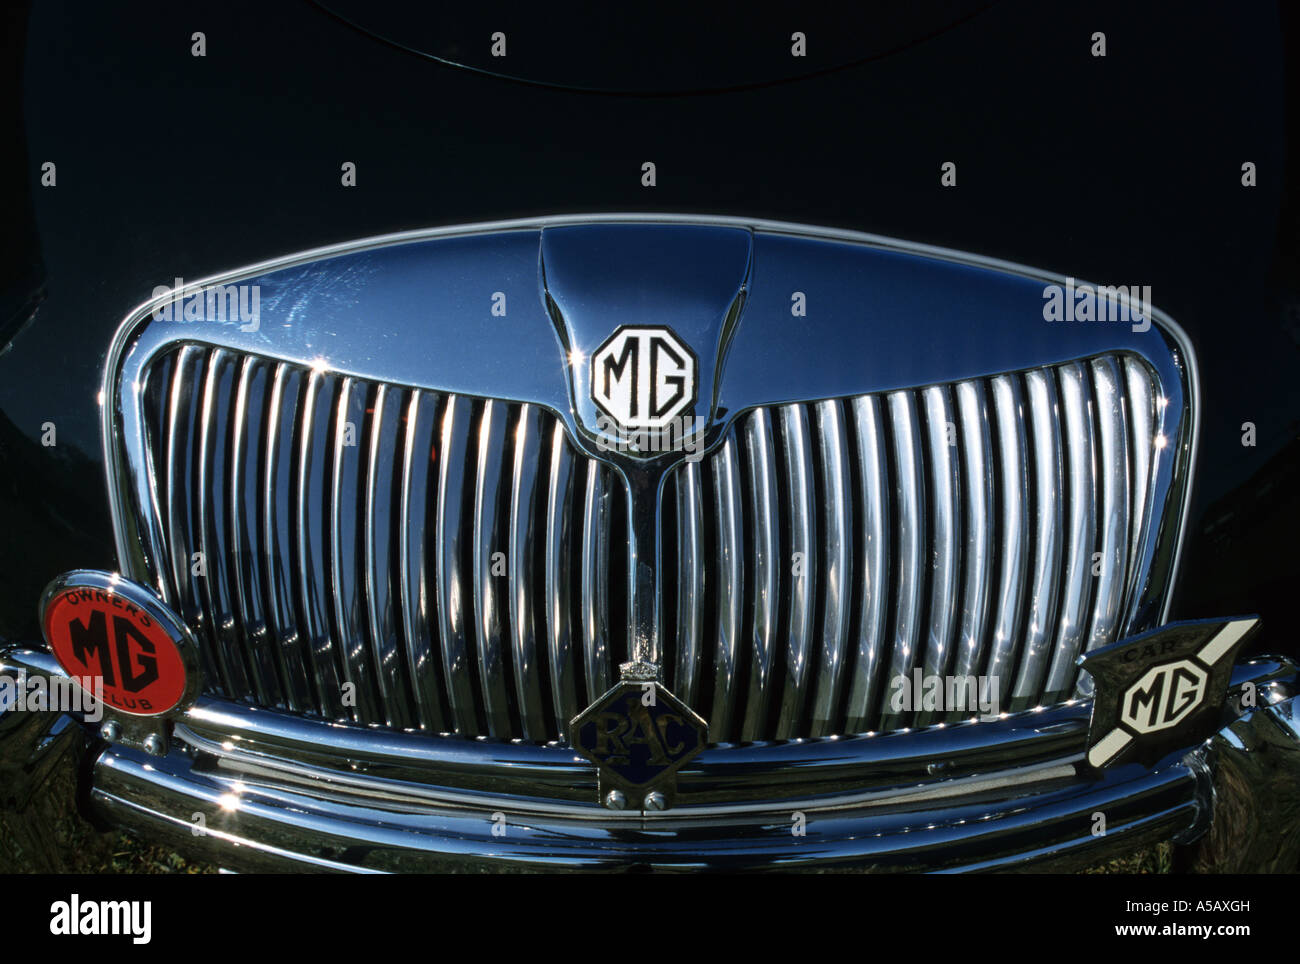 MG A Convertible 1500. English car manufacturer - Stock Image